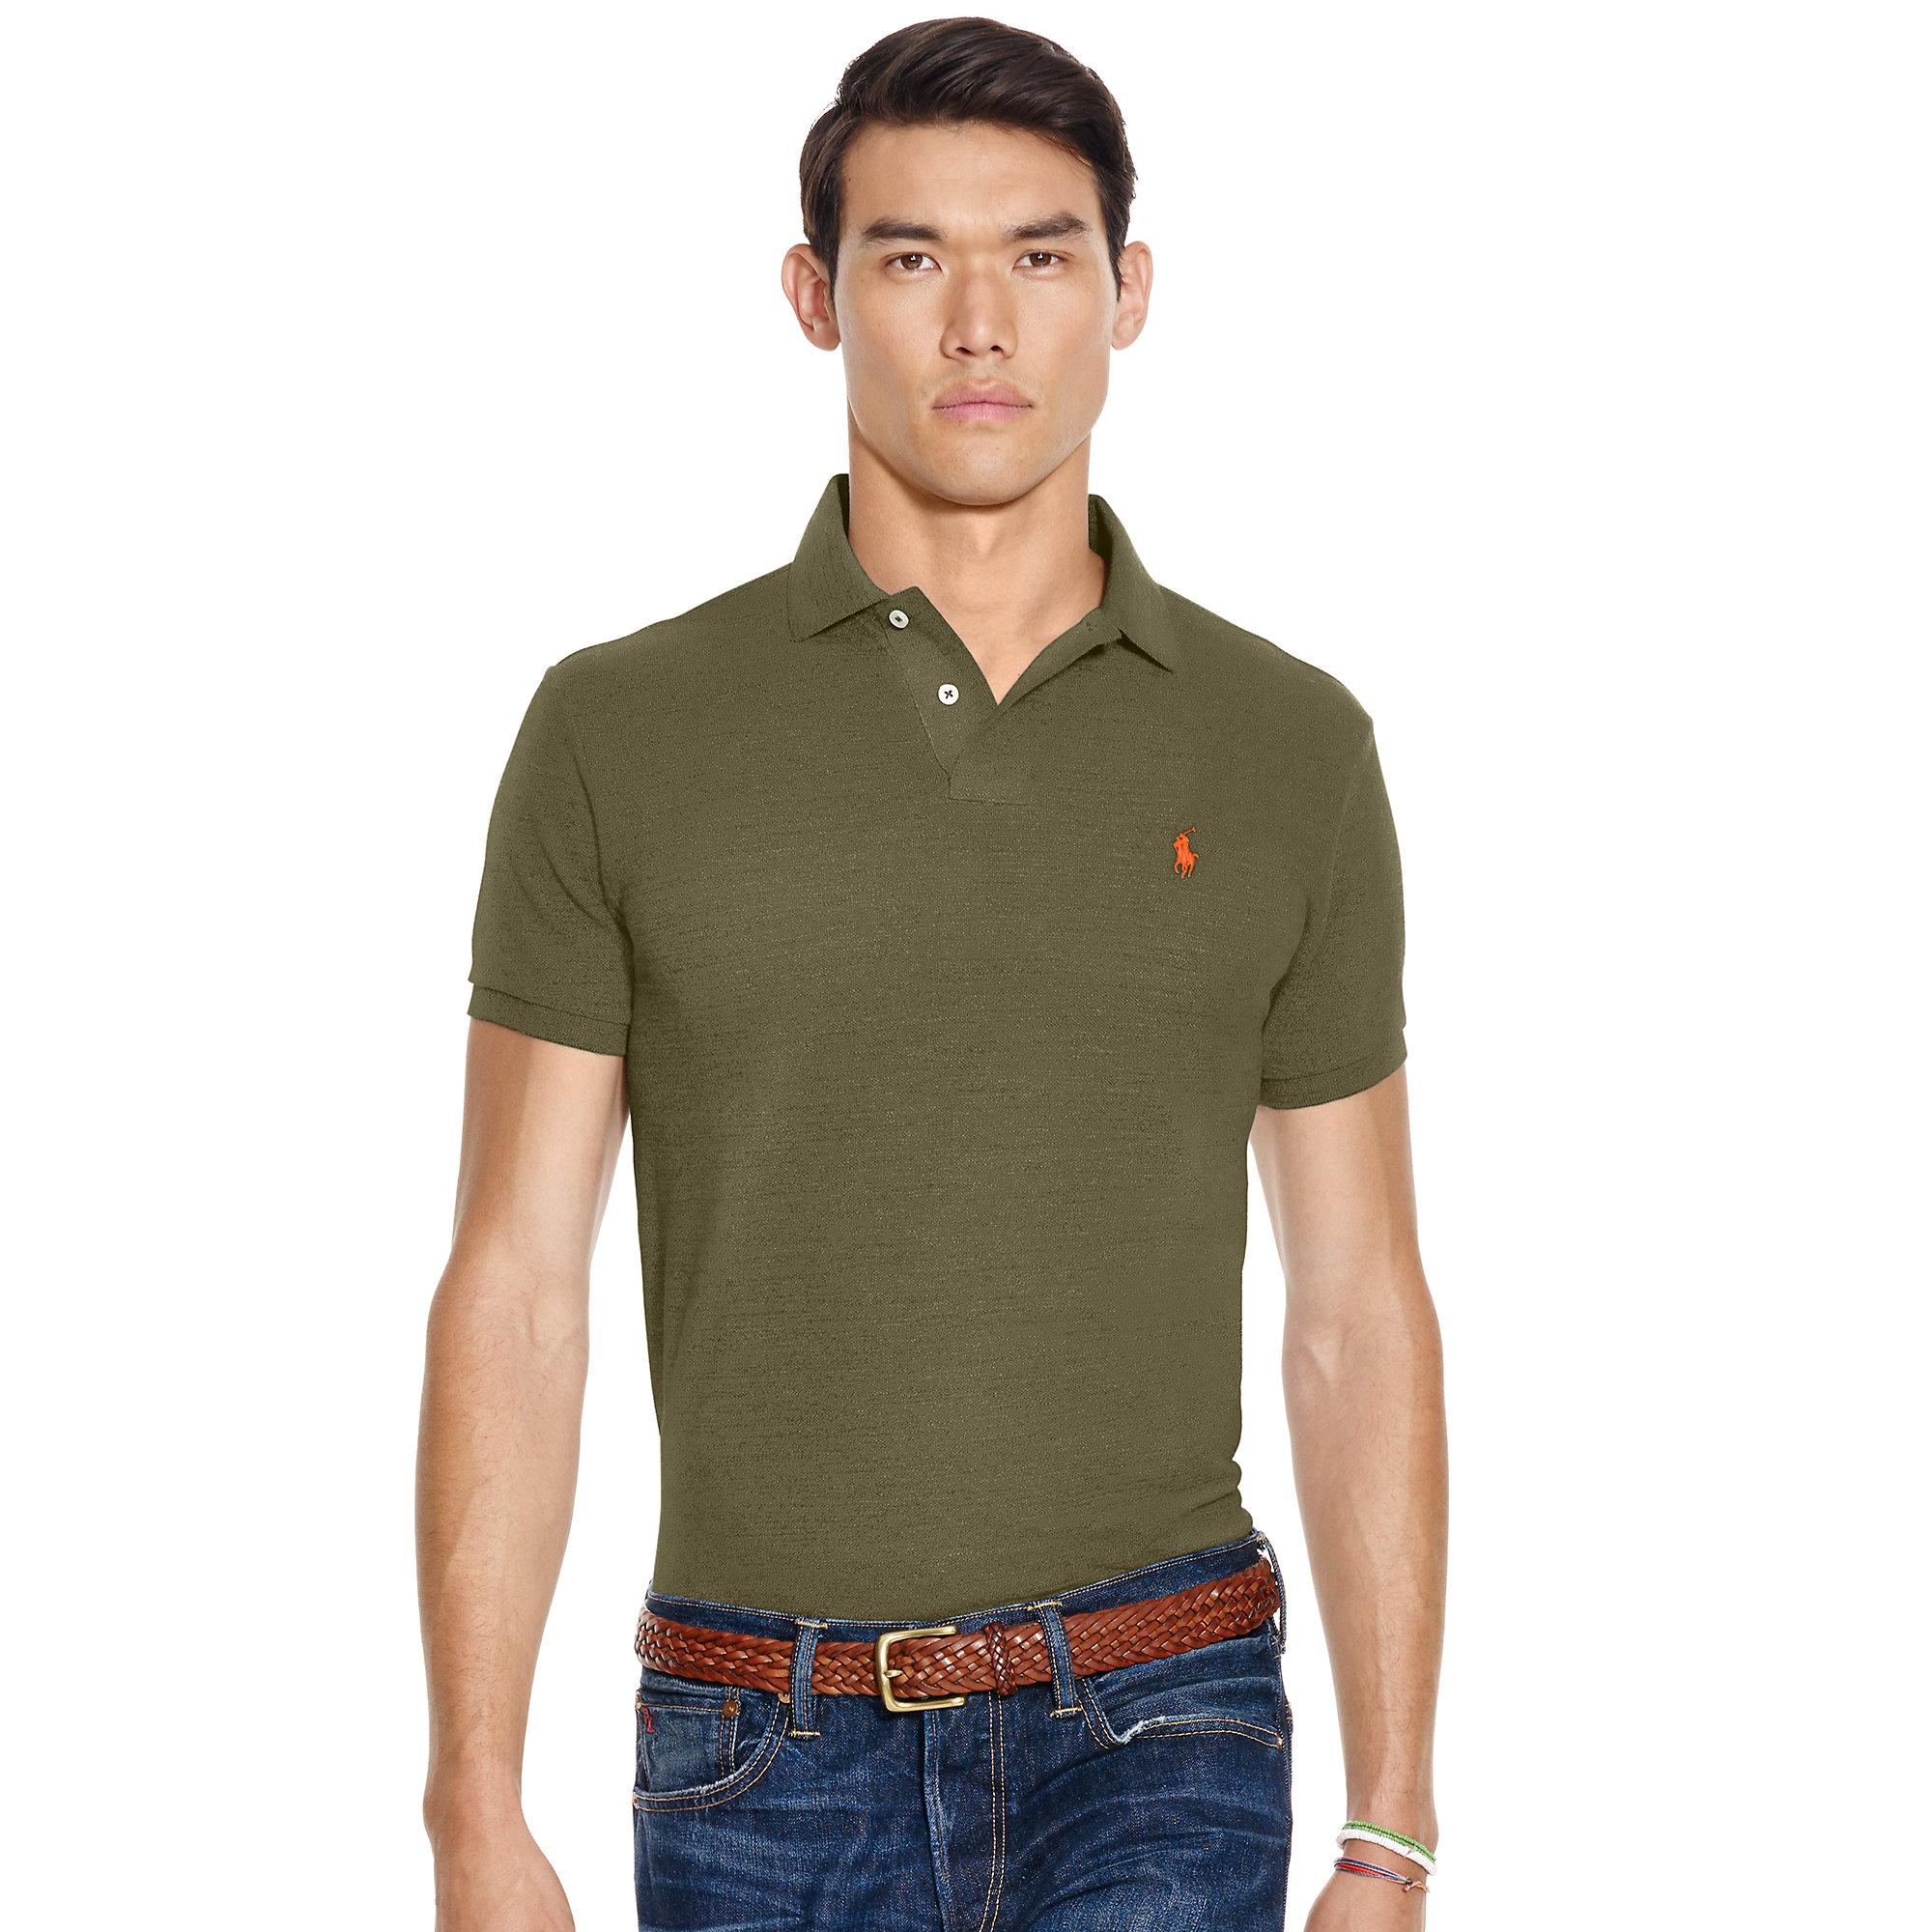 Lyst polo ralph lauren custom fit military polo shirt in for Polo ralph lauren custom fit polo shirt